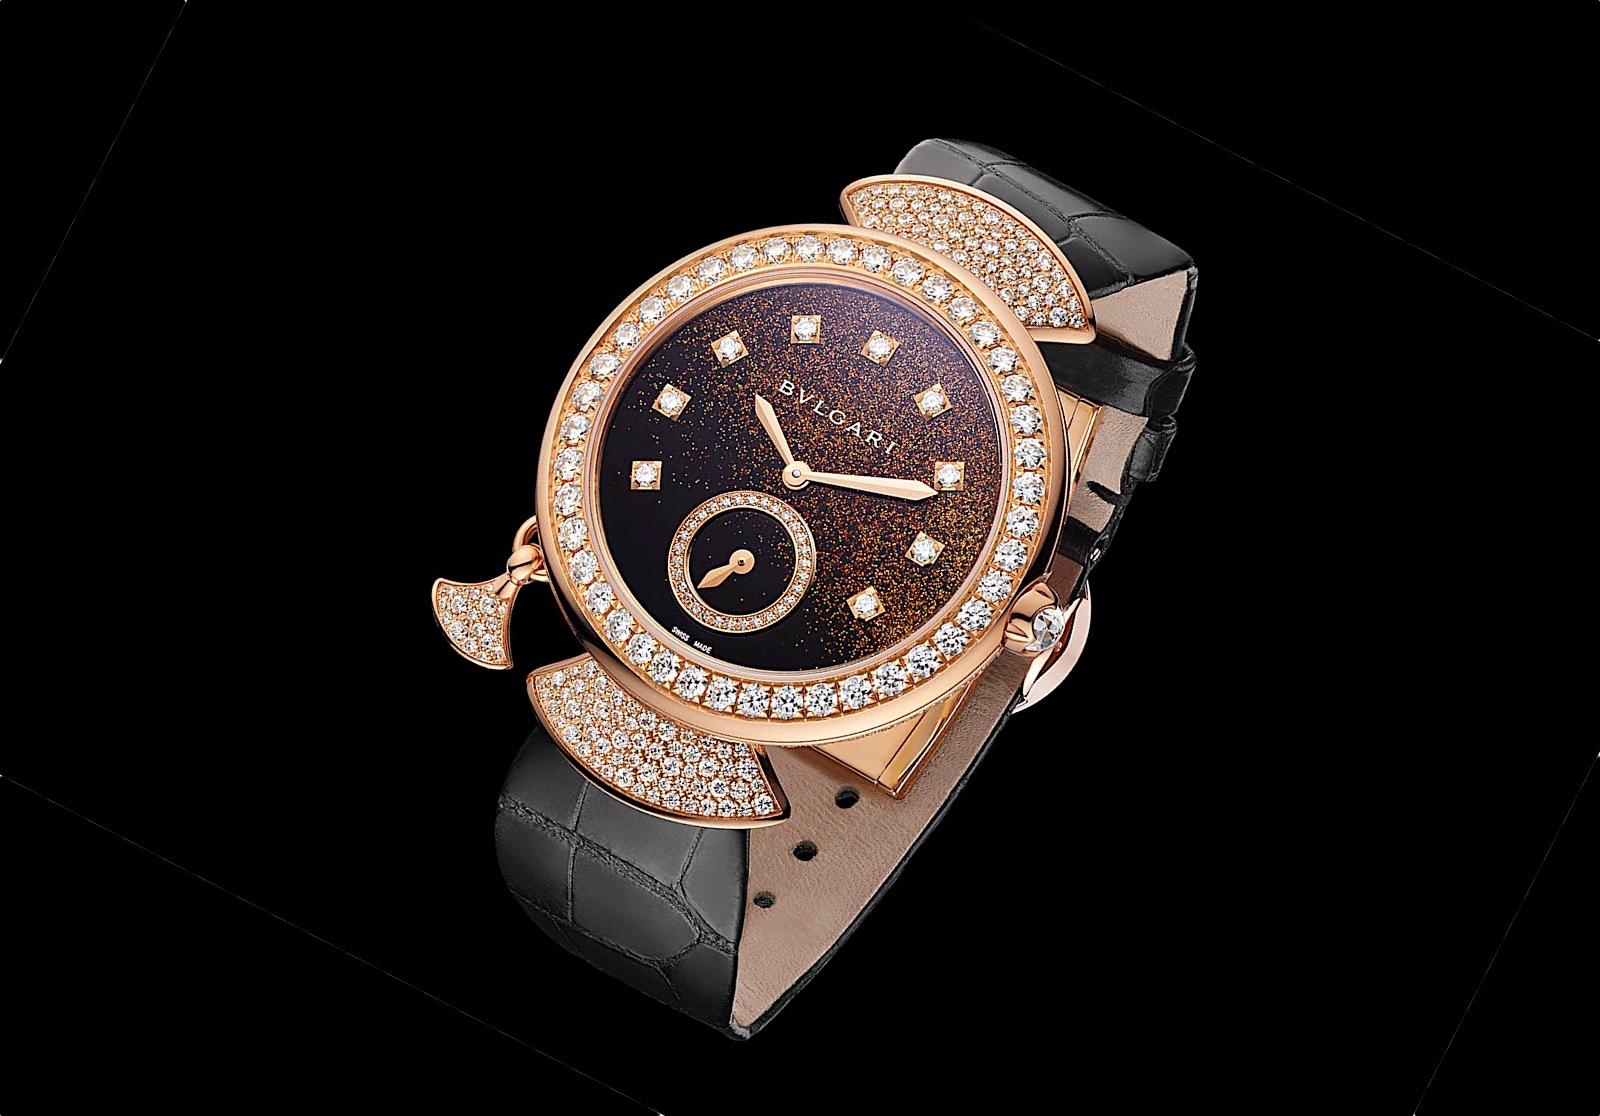 Los relojes femeninos de Bvlgari en Baselworld 2018 - Diva Finissima Minute Repeater